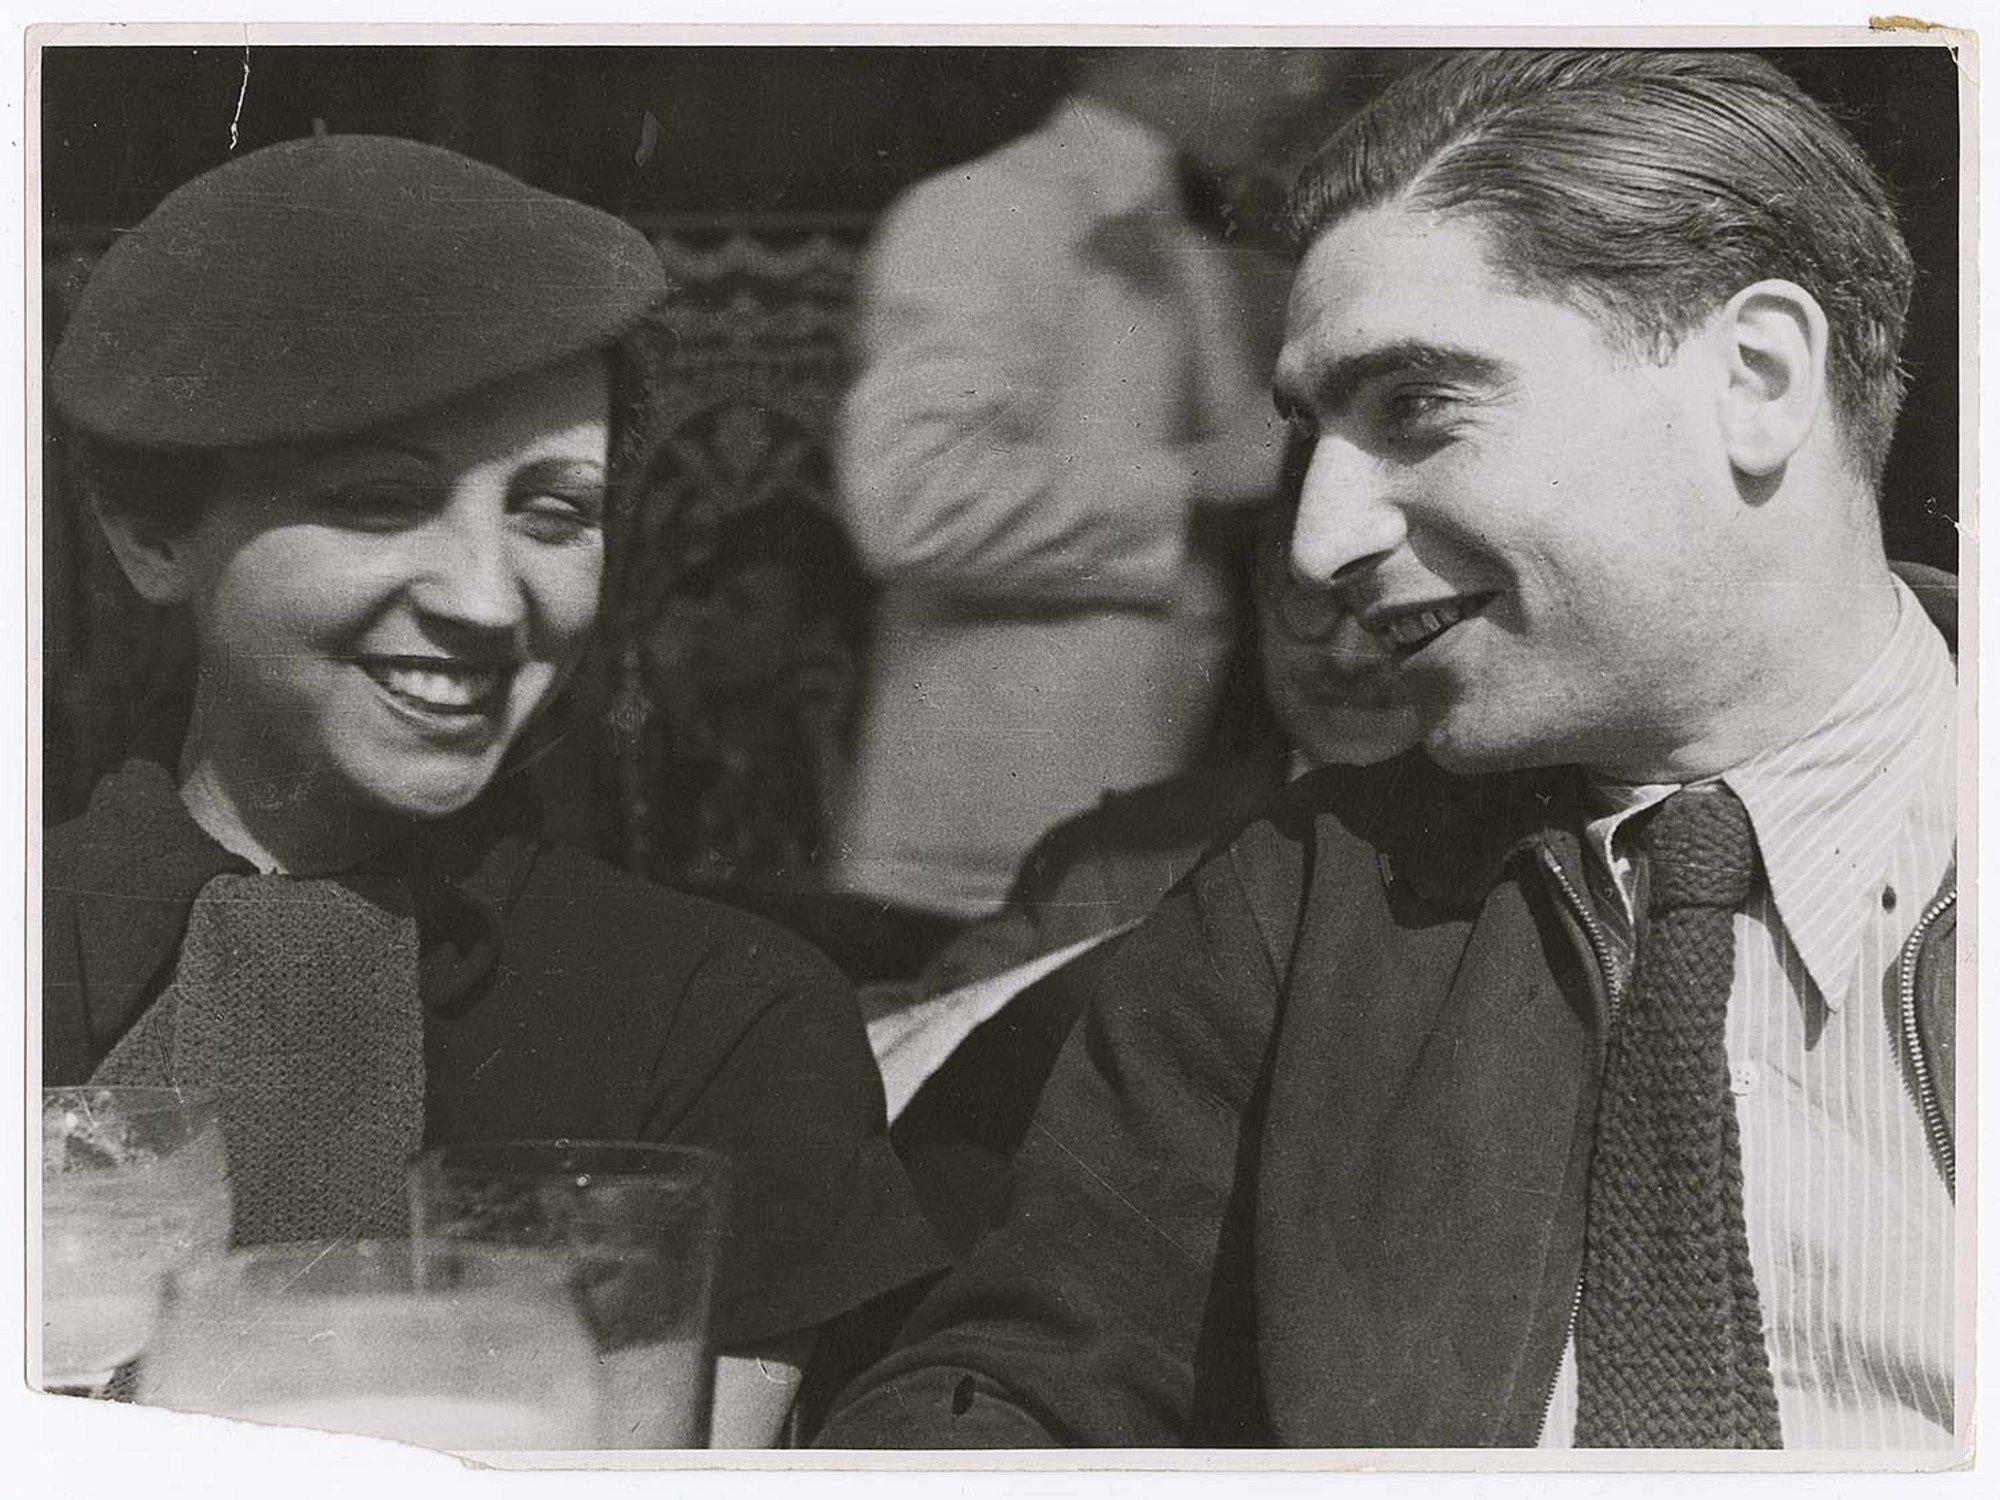 Fred Stein, Gerda Taro e Robert Capa, 1935